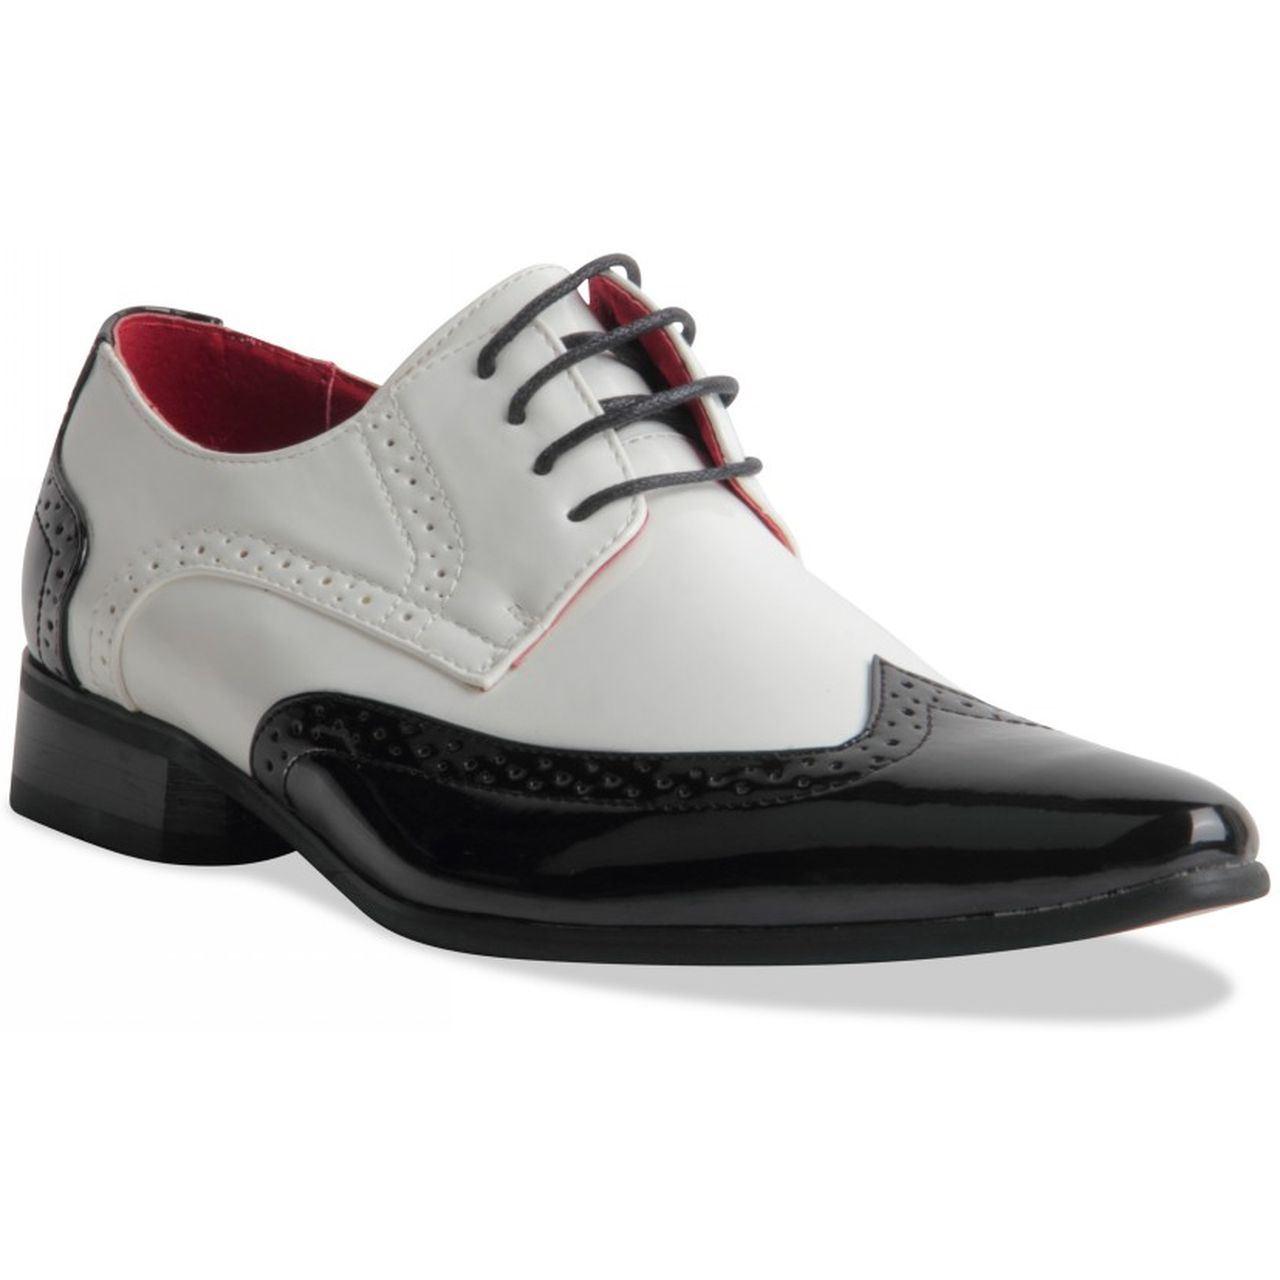 Smart Shoes Uk Collezione